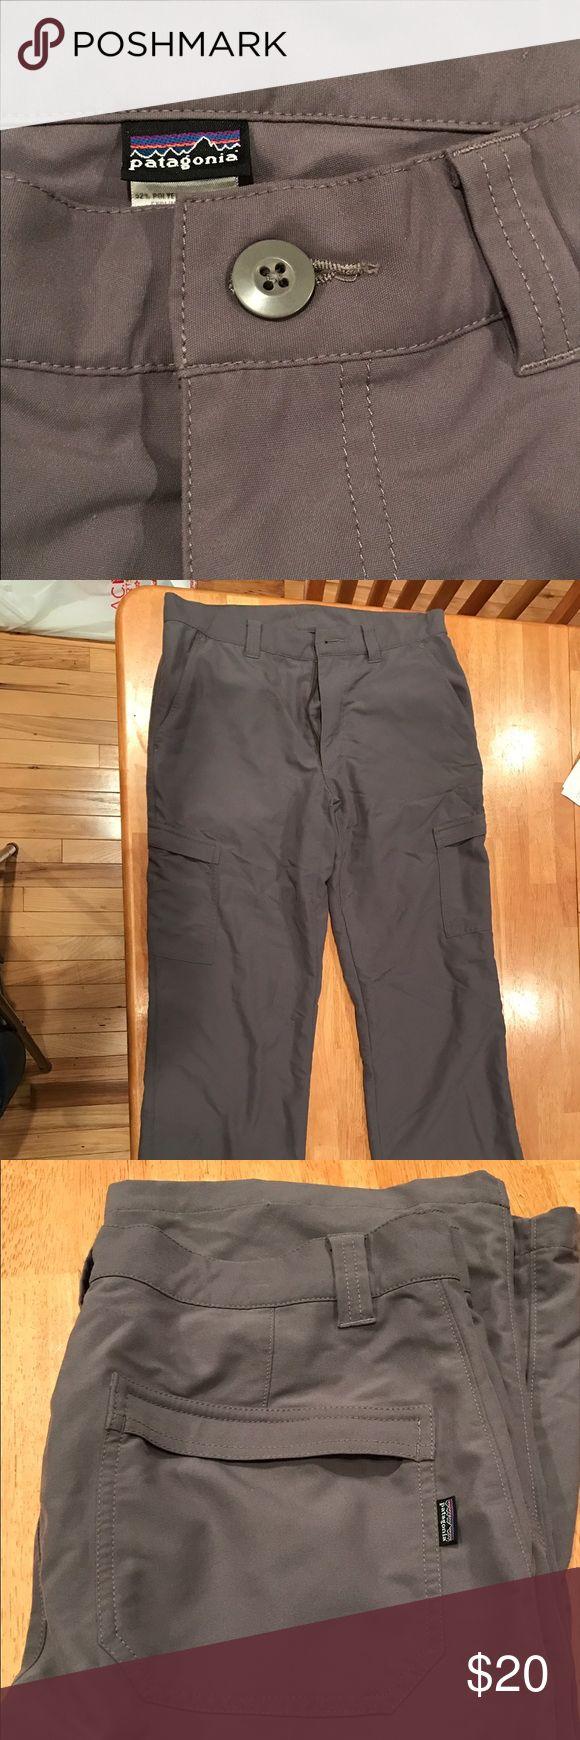 Patagonia Gray Pants Soft, versatile, gray Patagonia pants with two sleek cargo-style pockets Patagonia Pants Chinos & Khakis